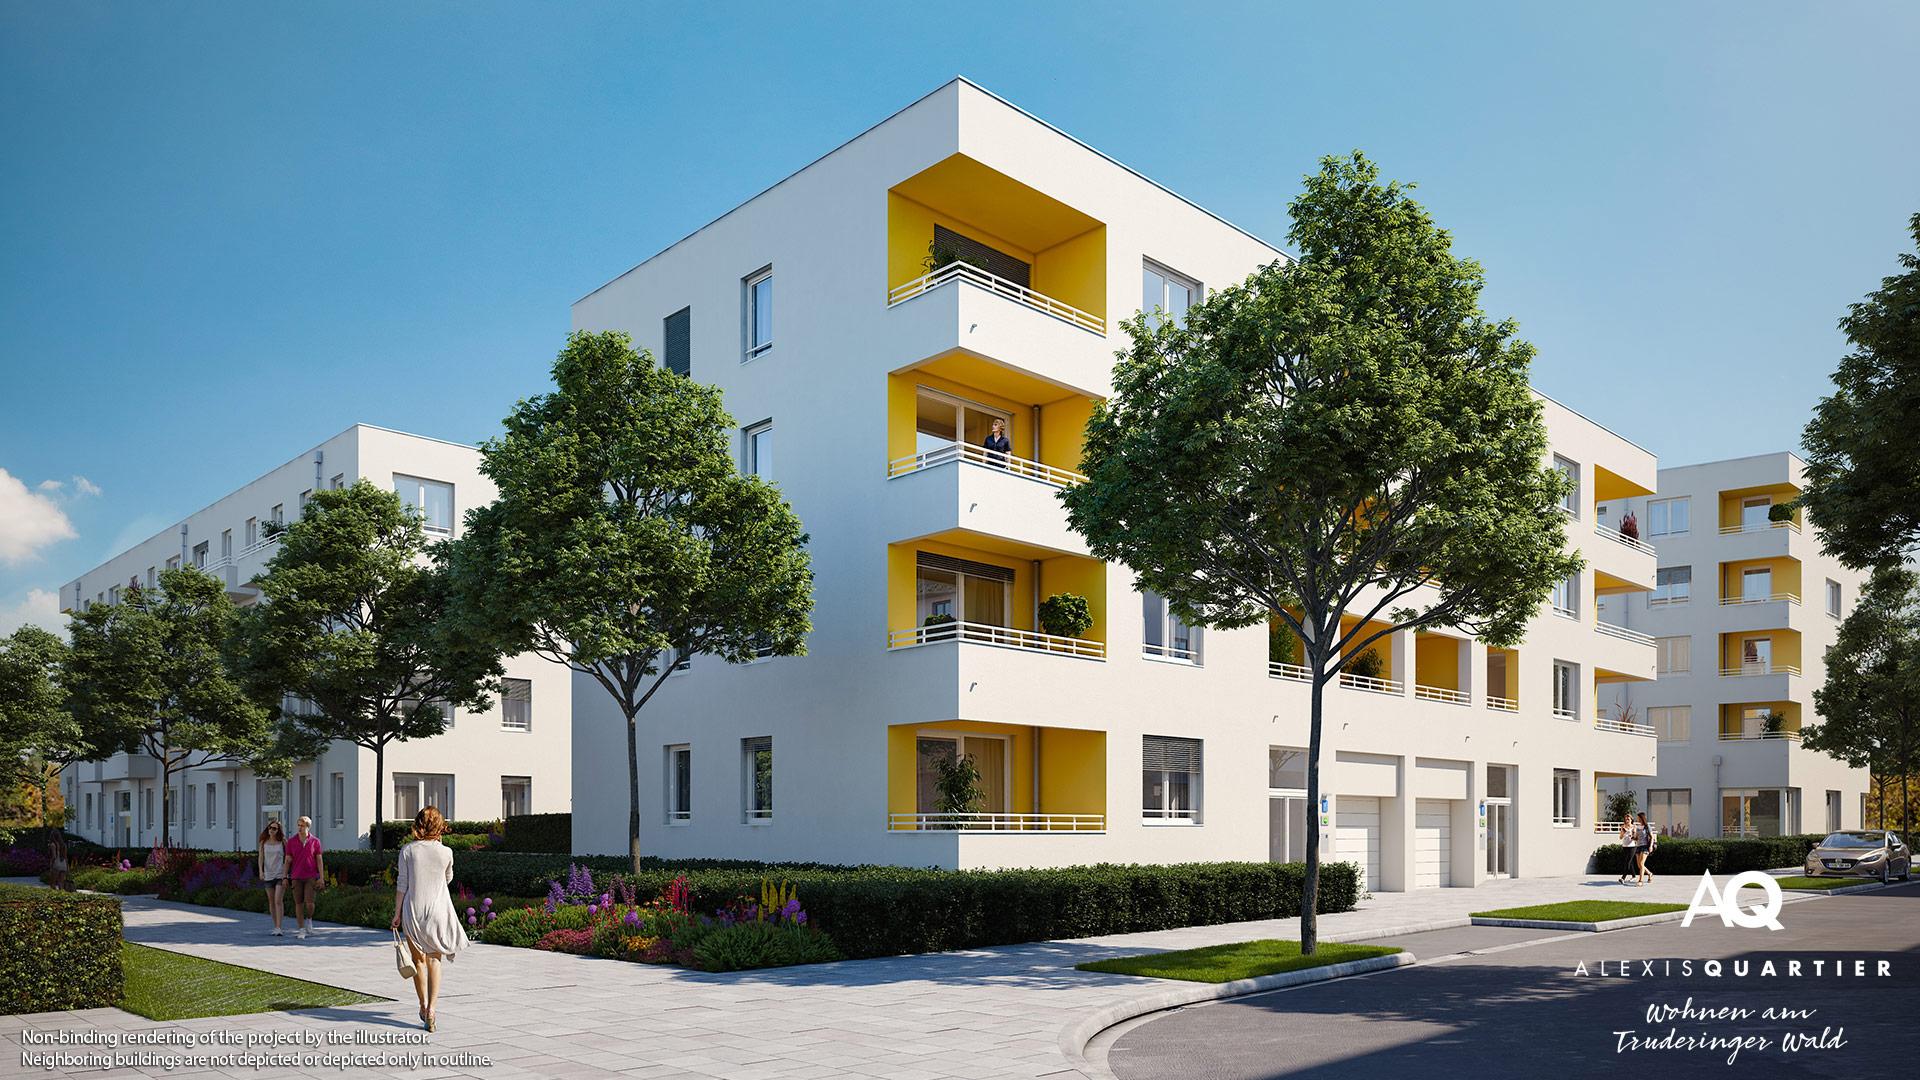 Property Alexisquartier - Wohnen am Truderinger Wald - Illustration 5